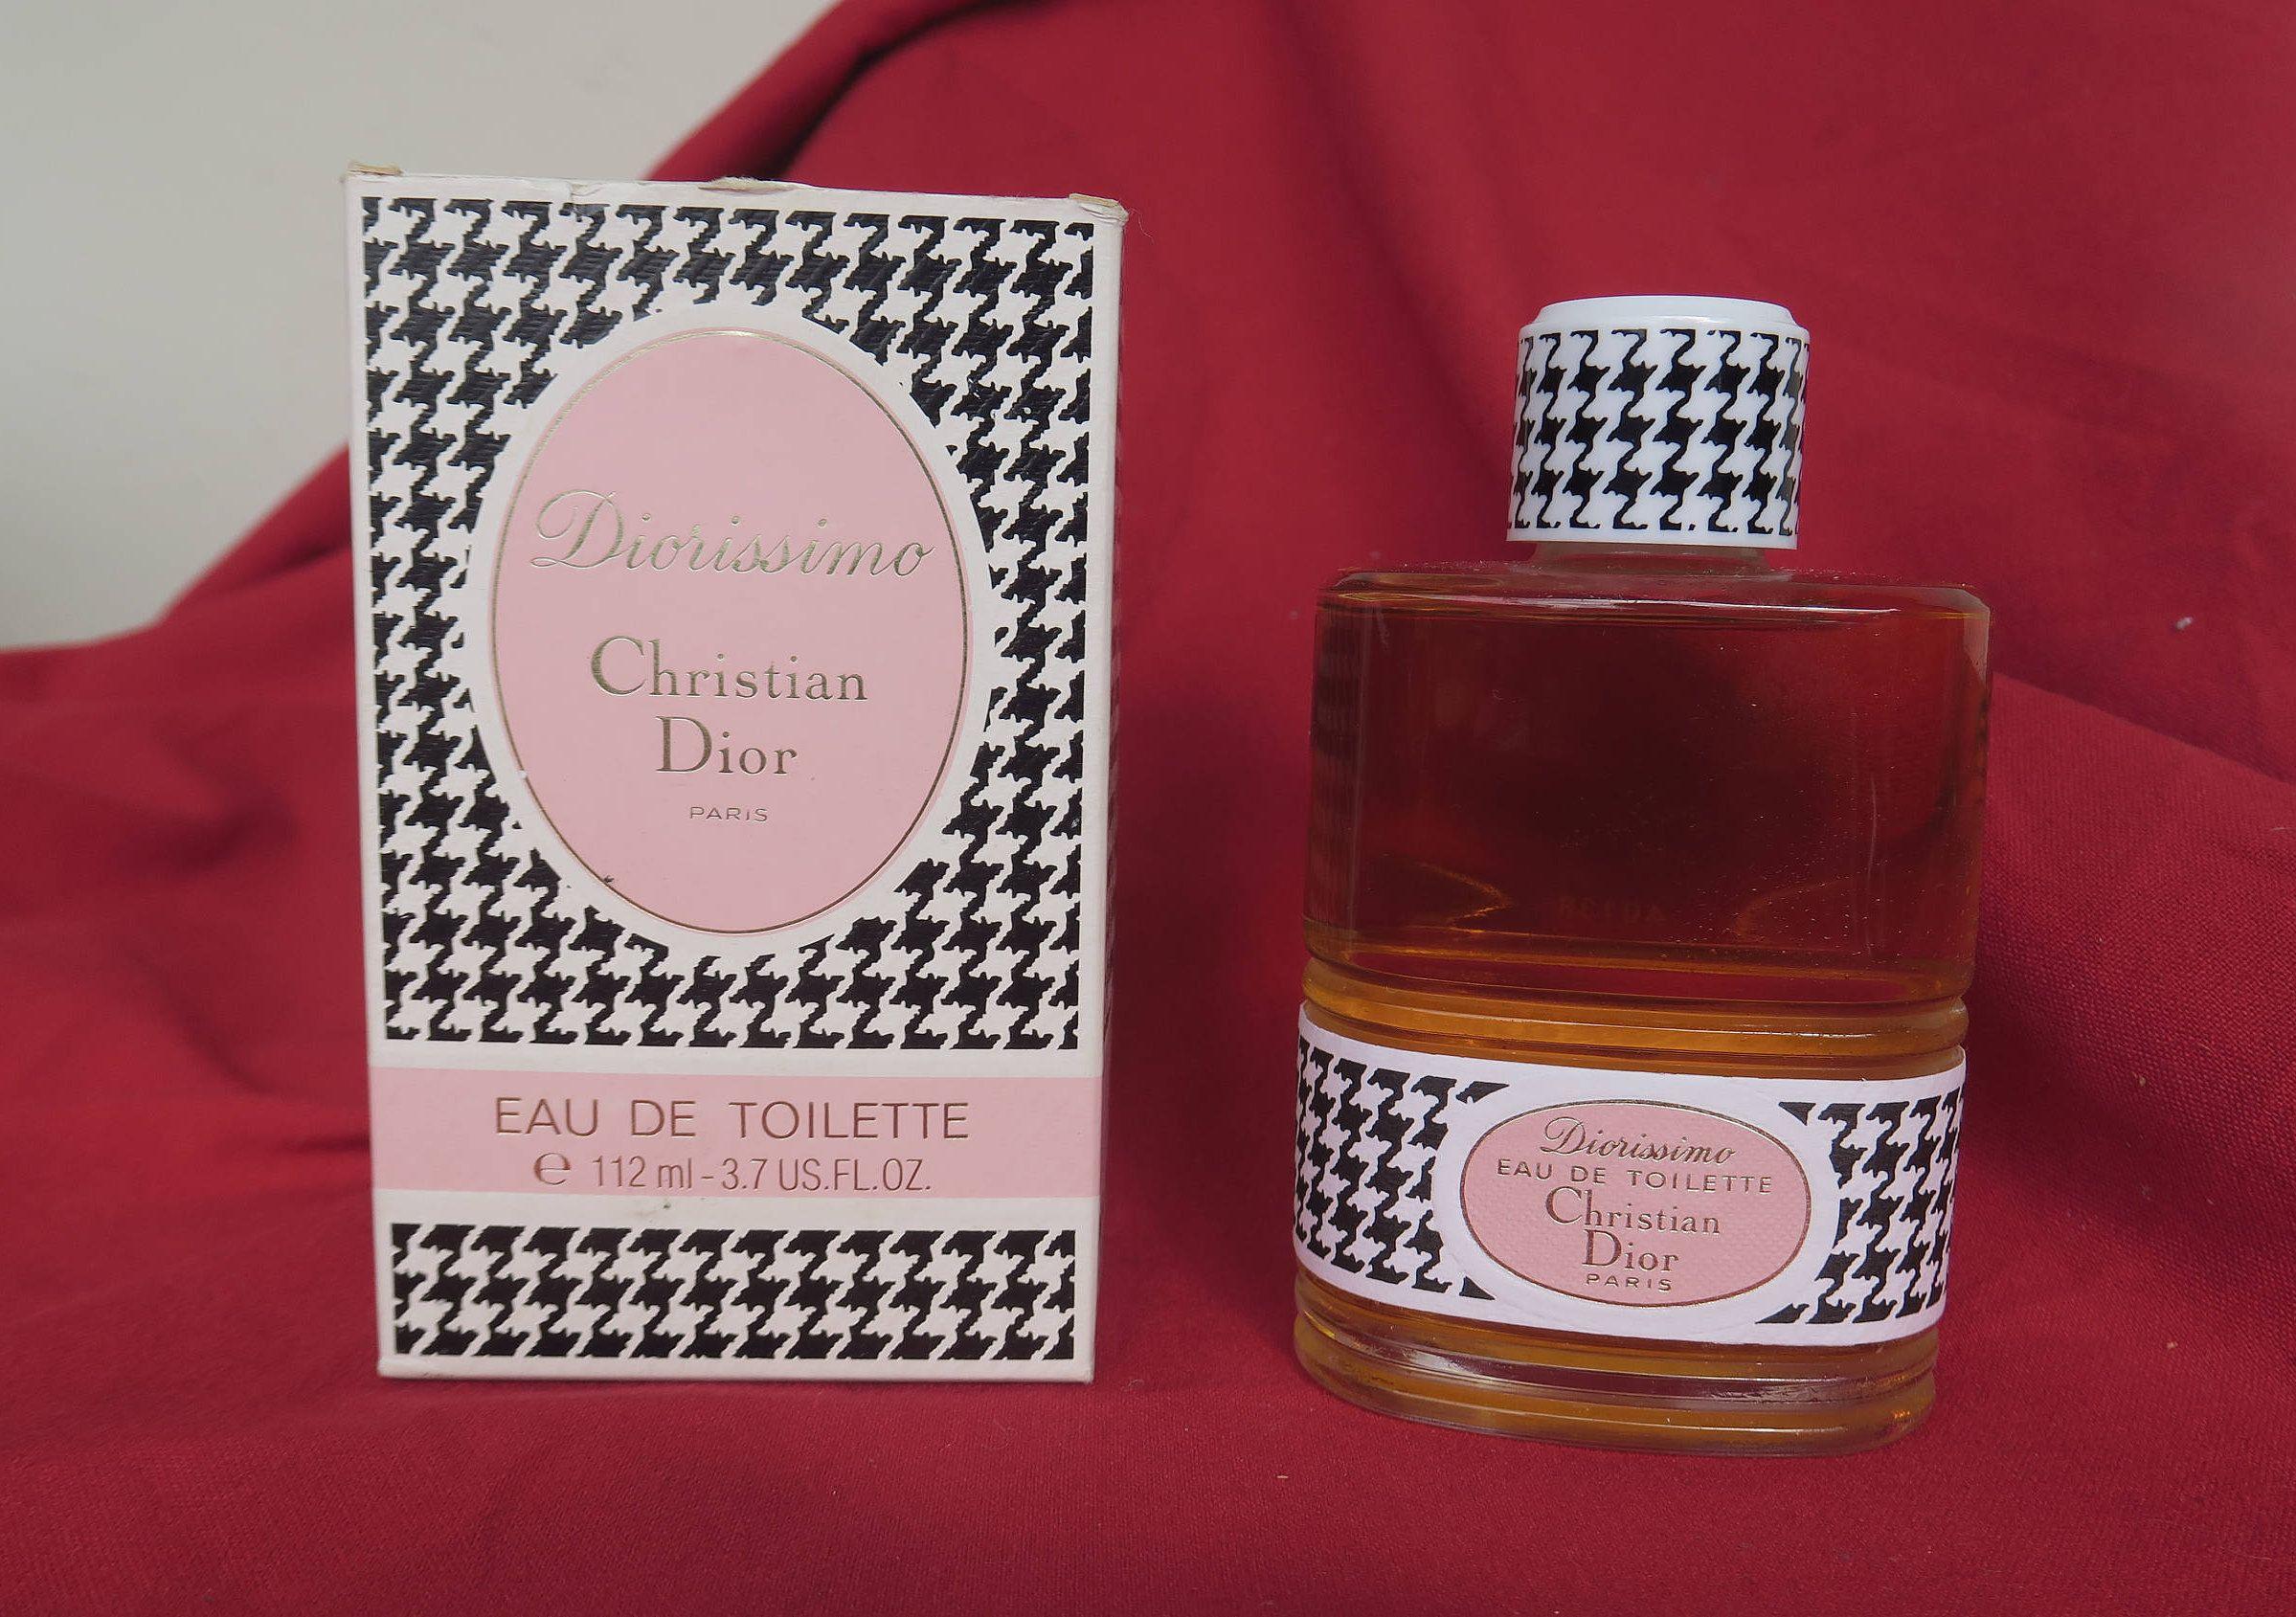 Diorissimo De Christian Dior Eau De Toilette 112 Ml Flacon Vintage